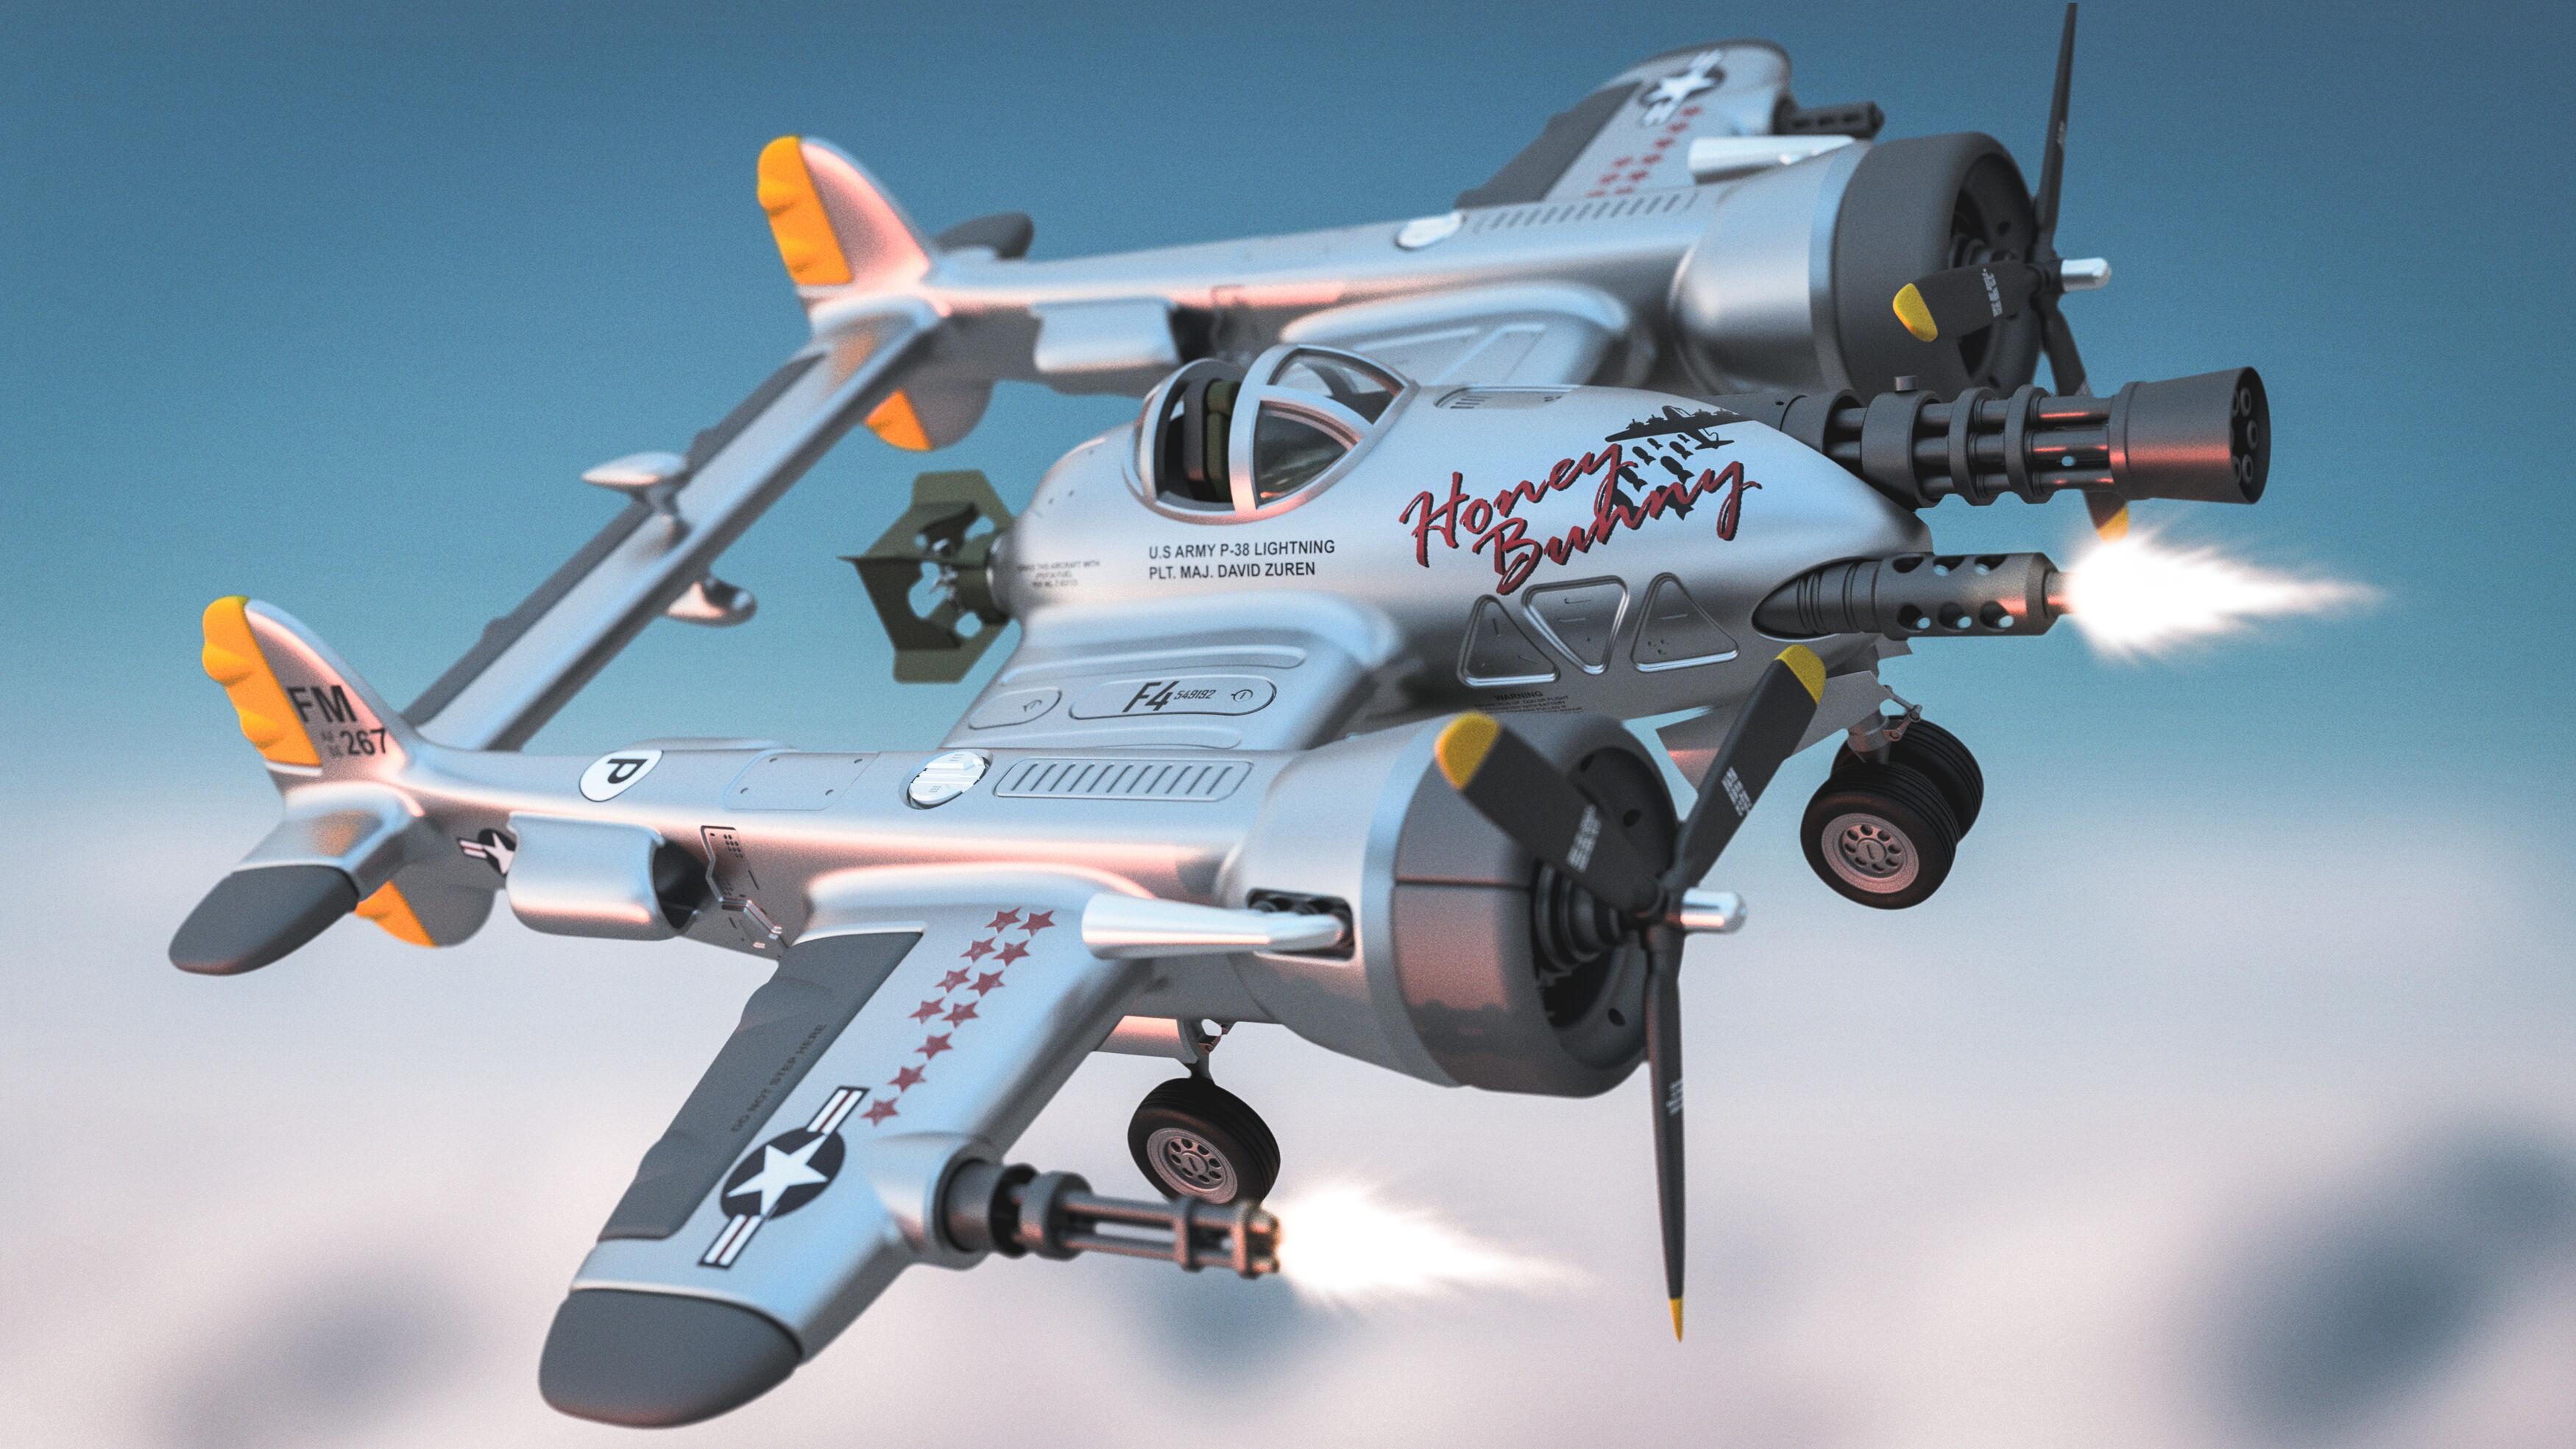 P-38-lightning-01-3500-3500